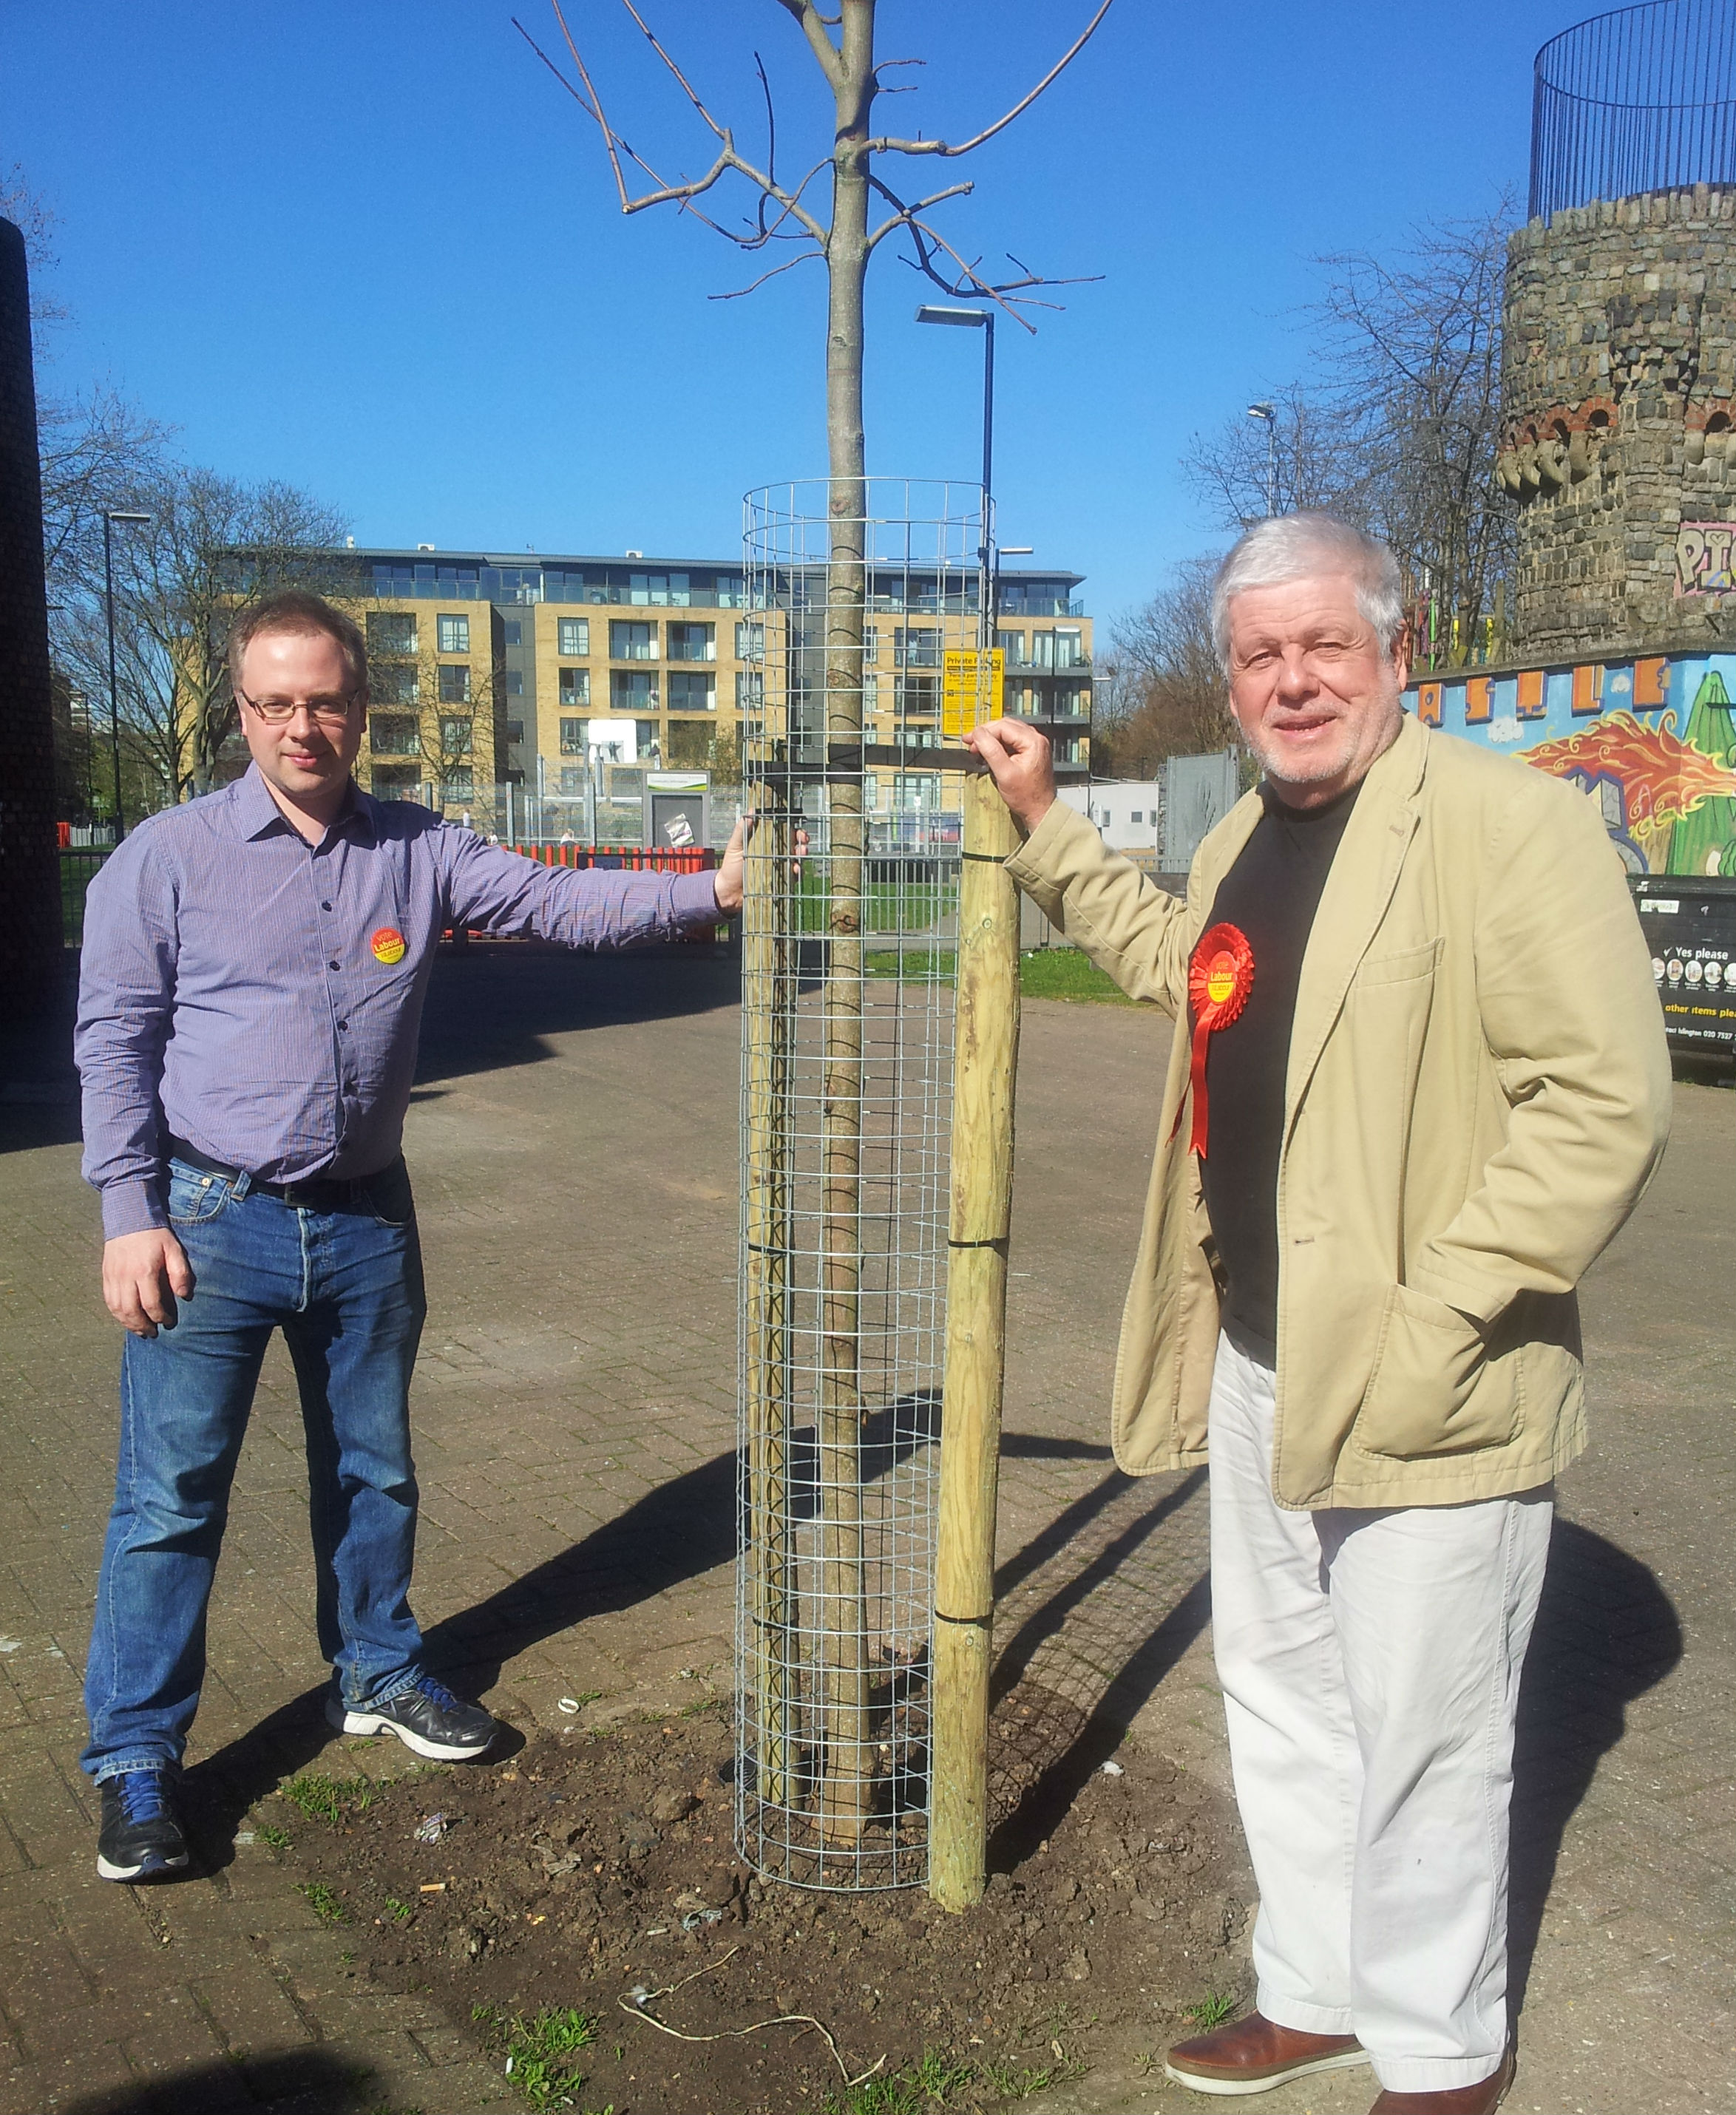 labour councillors representing caledonian ward in islington paul bingfield street tree 3 rupert and richard 20140316 131507 web